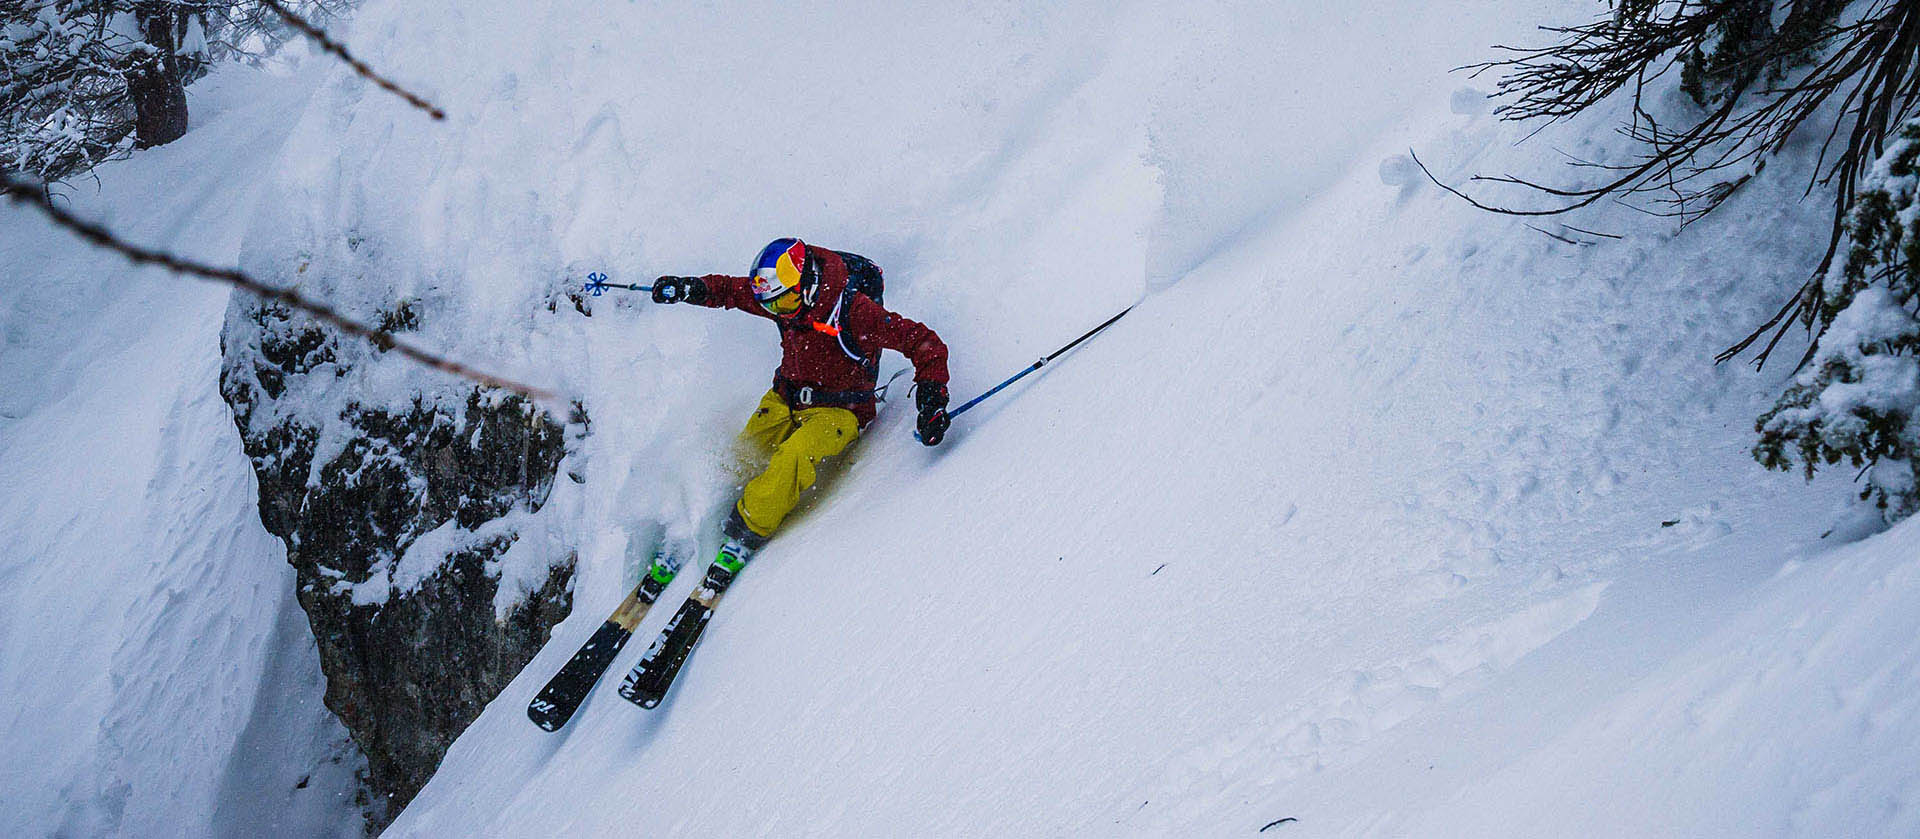 Freeriden und Skitouren mit Völkl